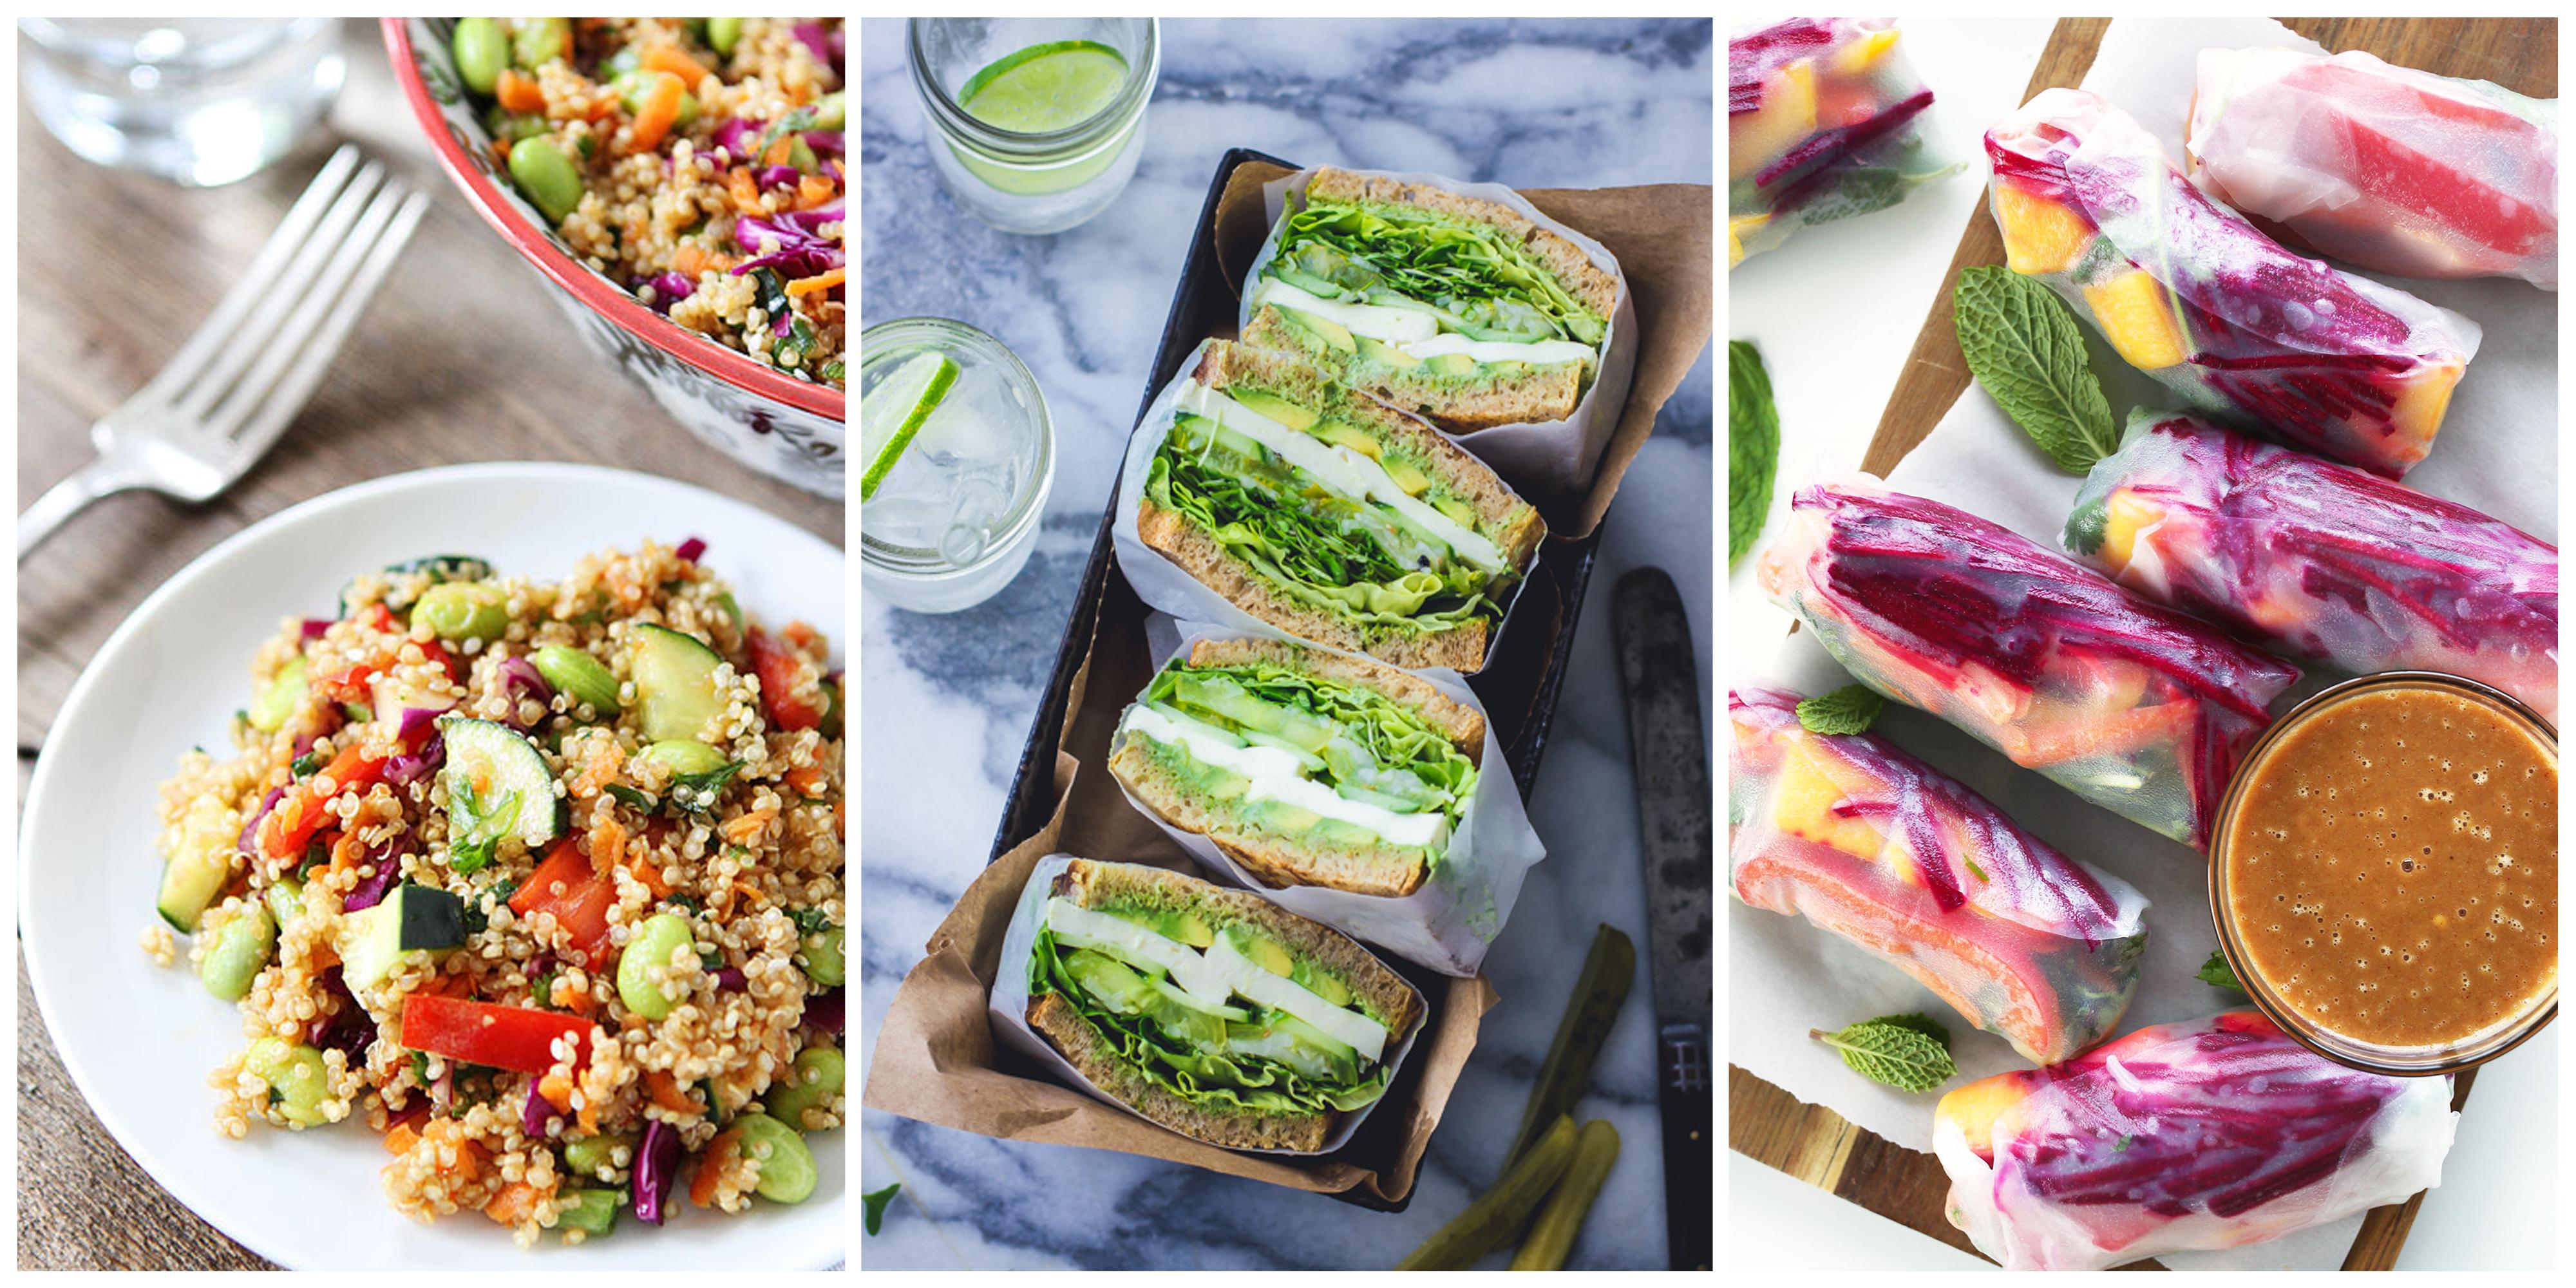 10 Delicious Picnic Food Ideas - Creative Summer Picnic ...